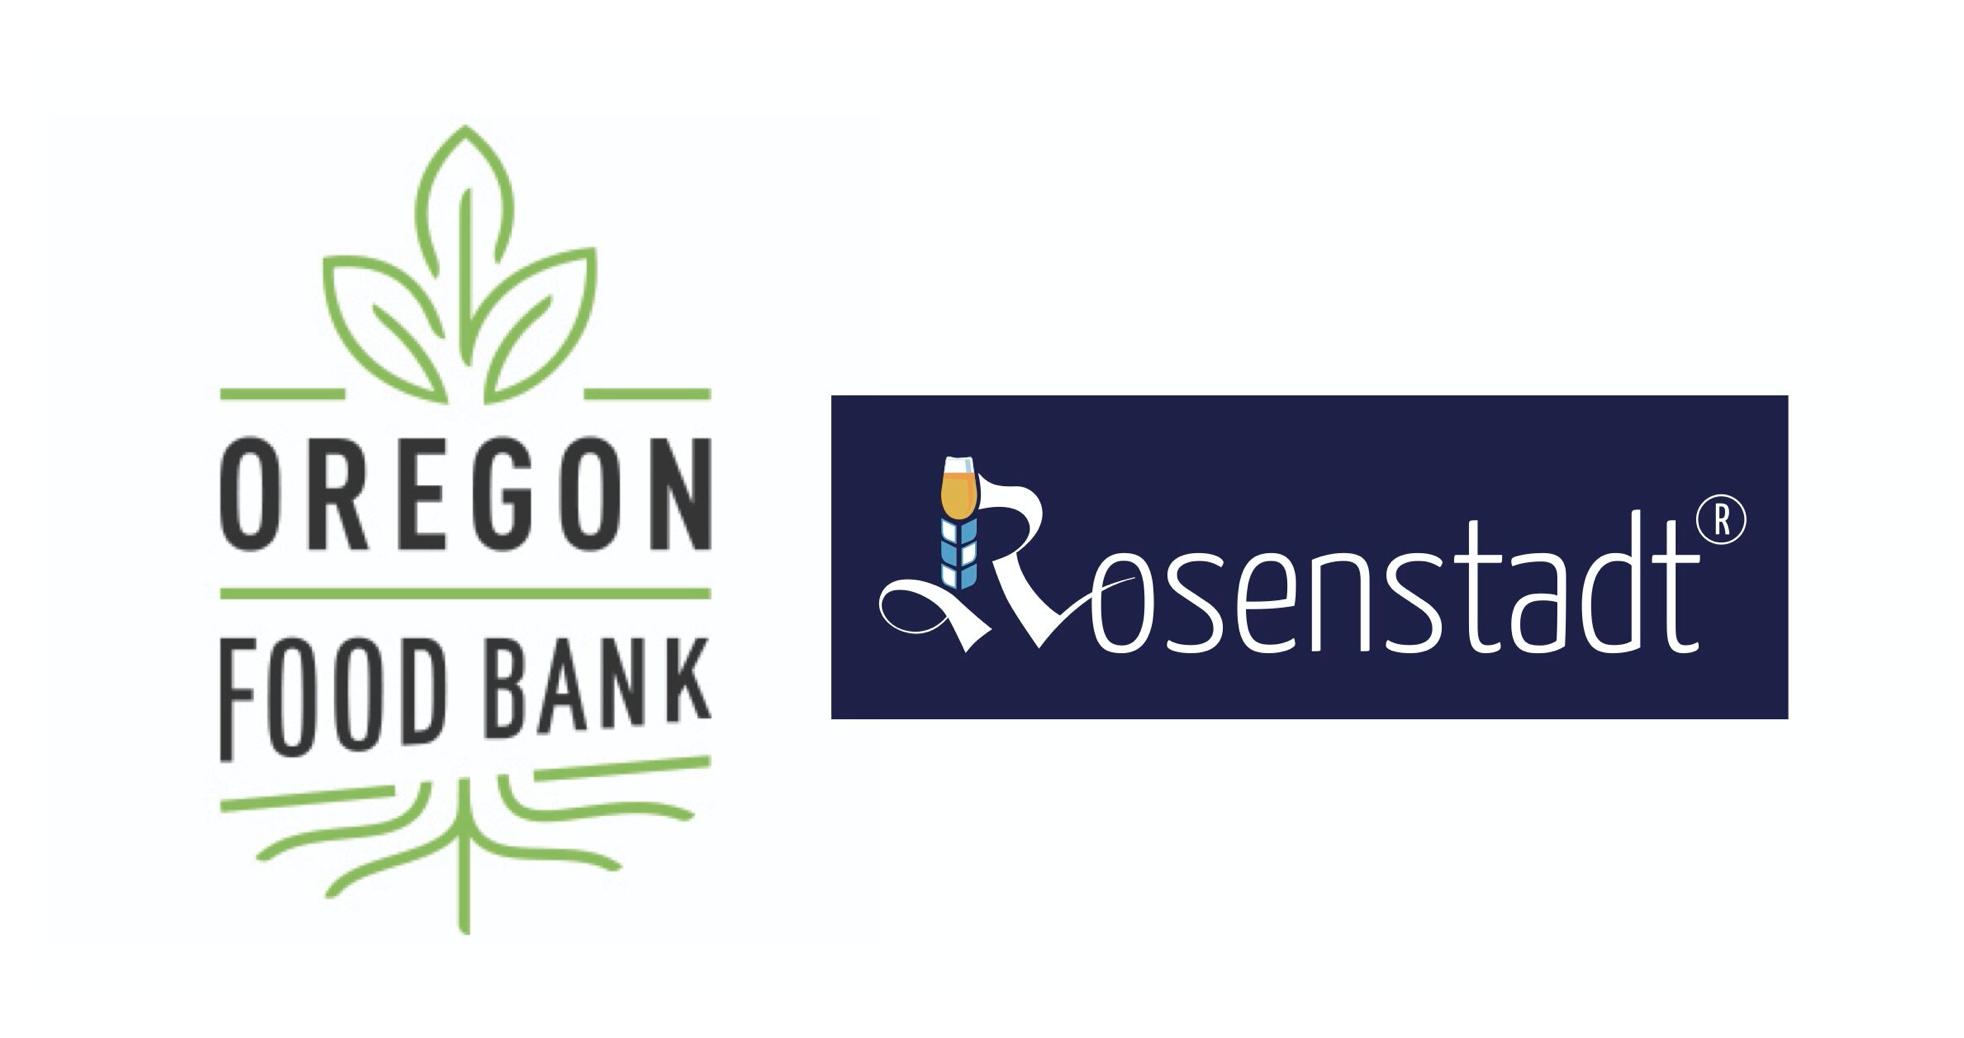 Rosenstadt Brewery + Oregon Food Bank